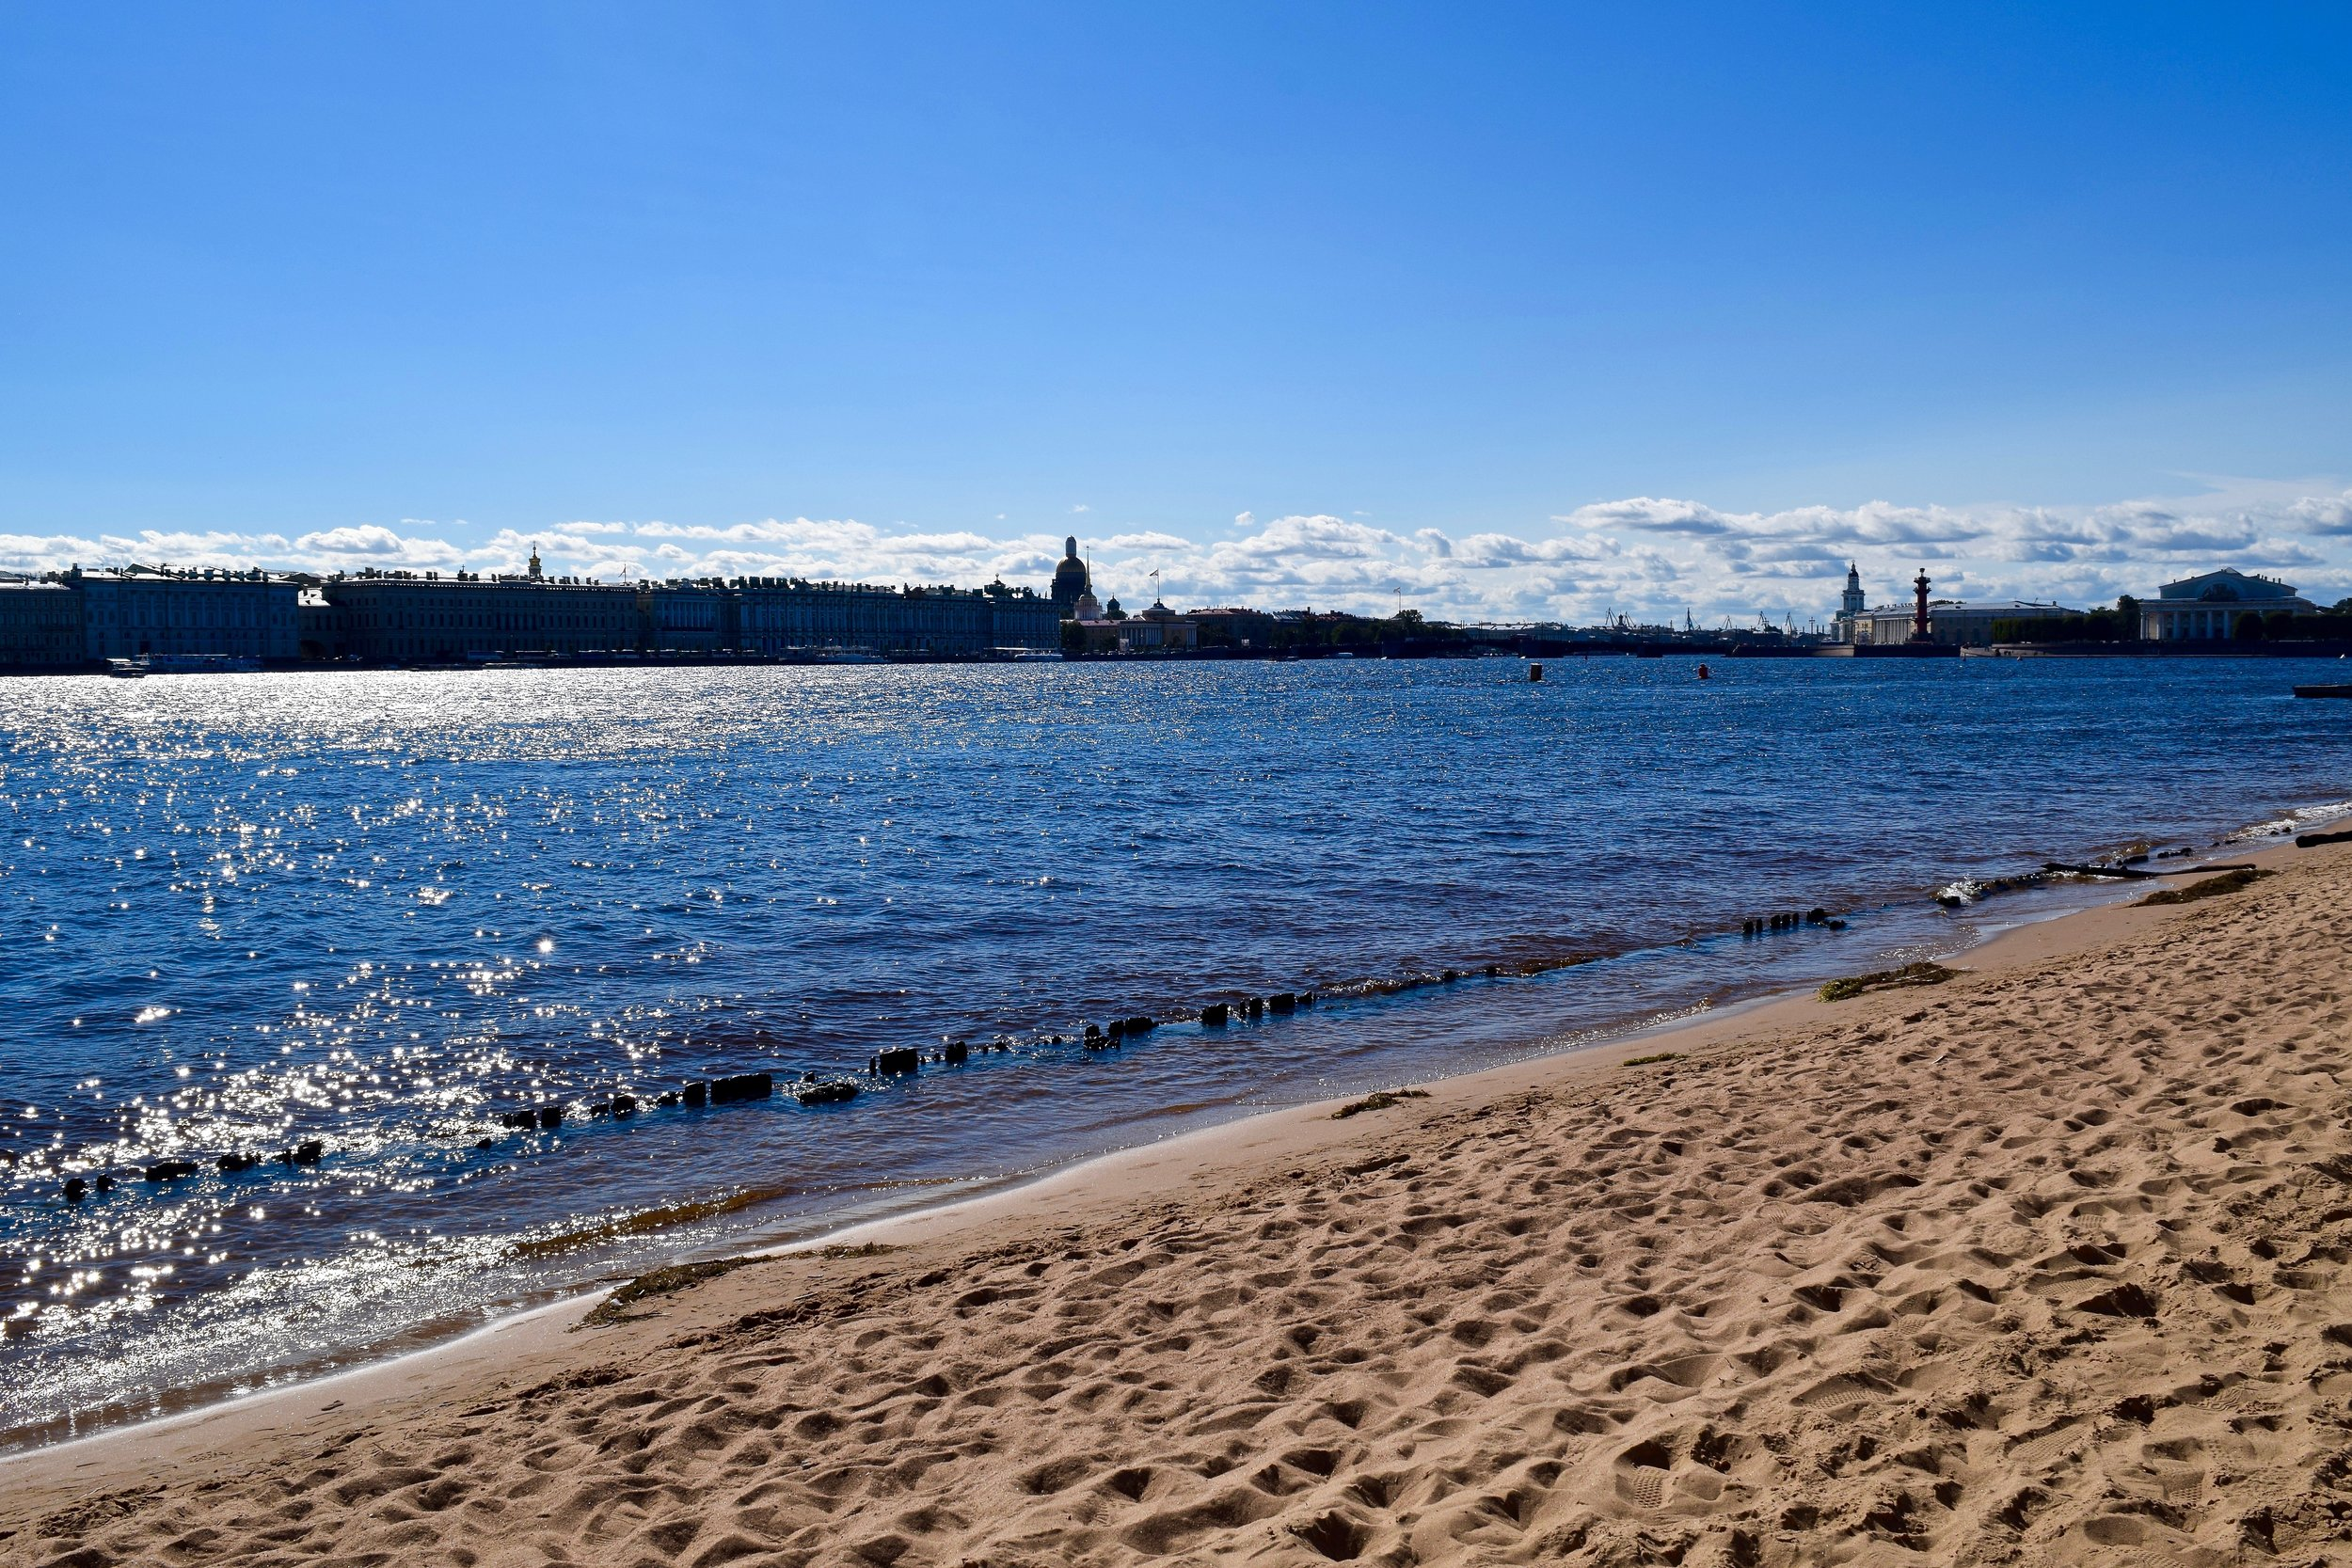 St. Petersburg's beach